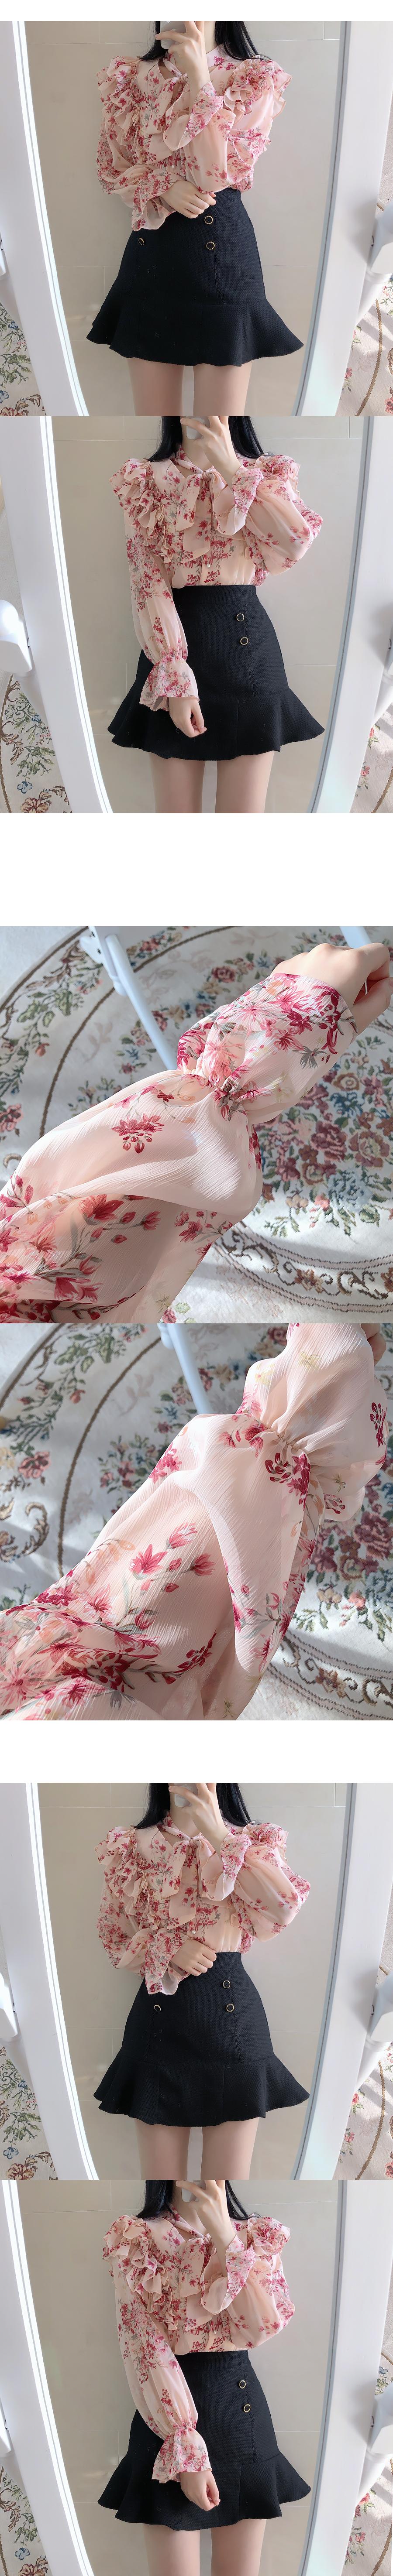 Cherry blossom ending ruffle ribbon